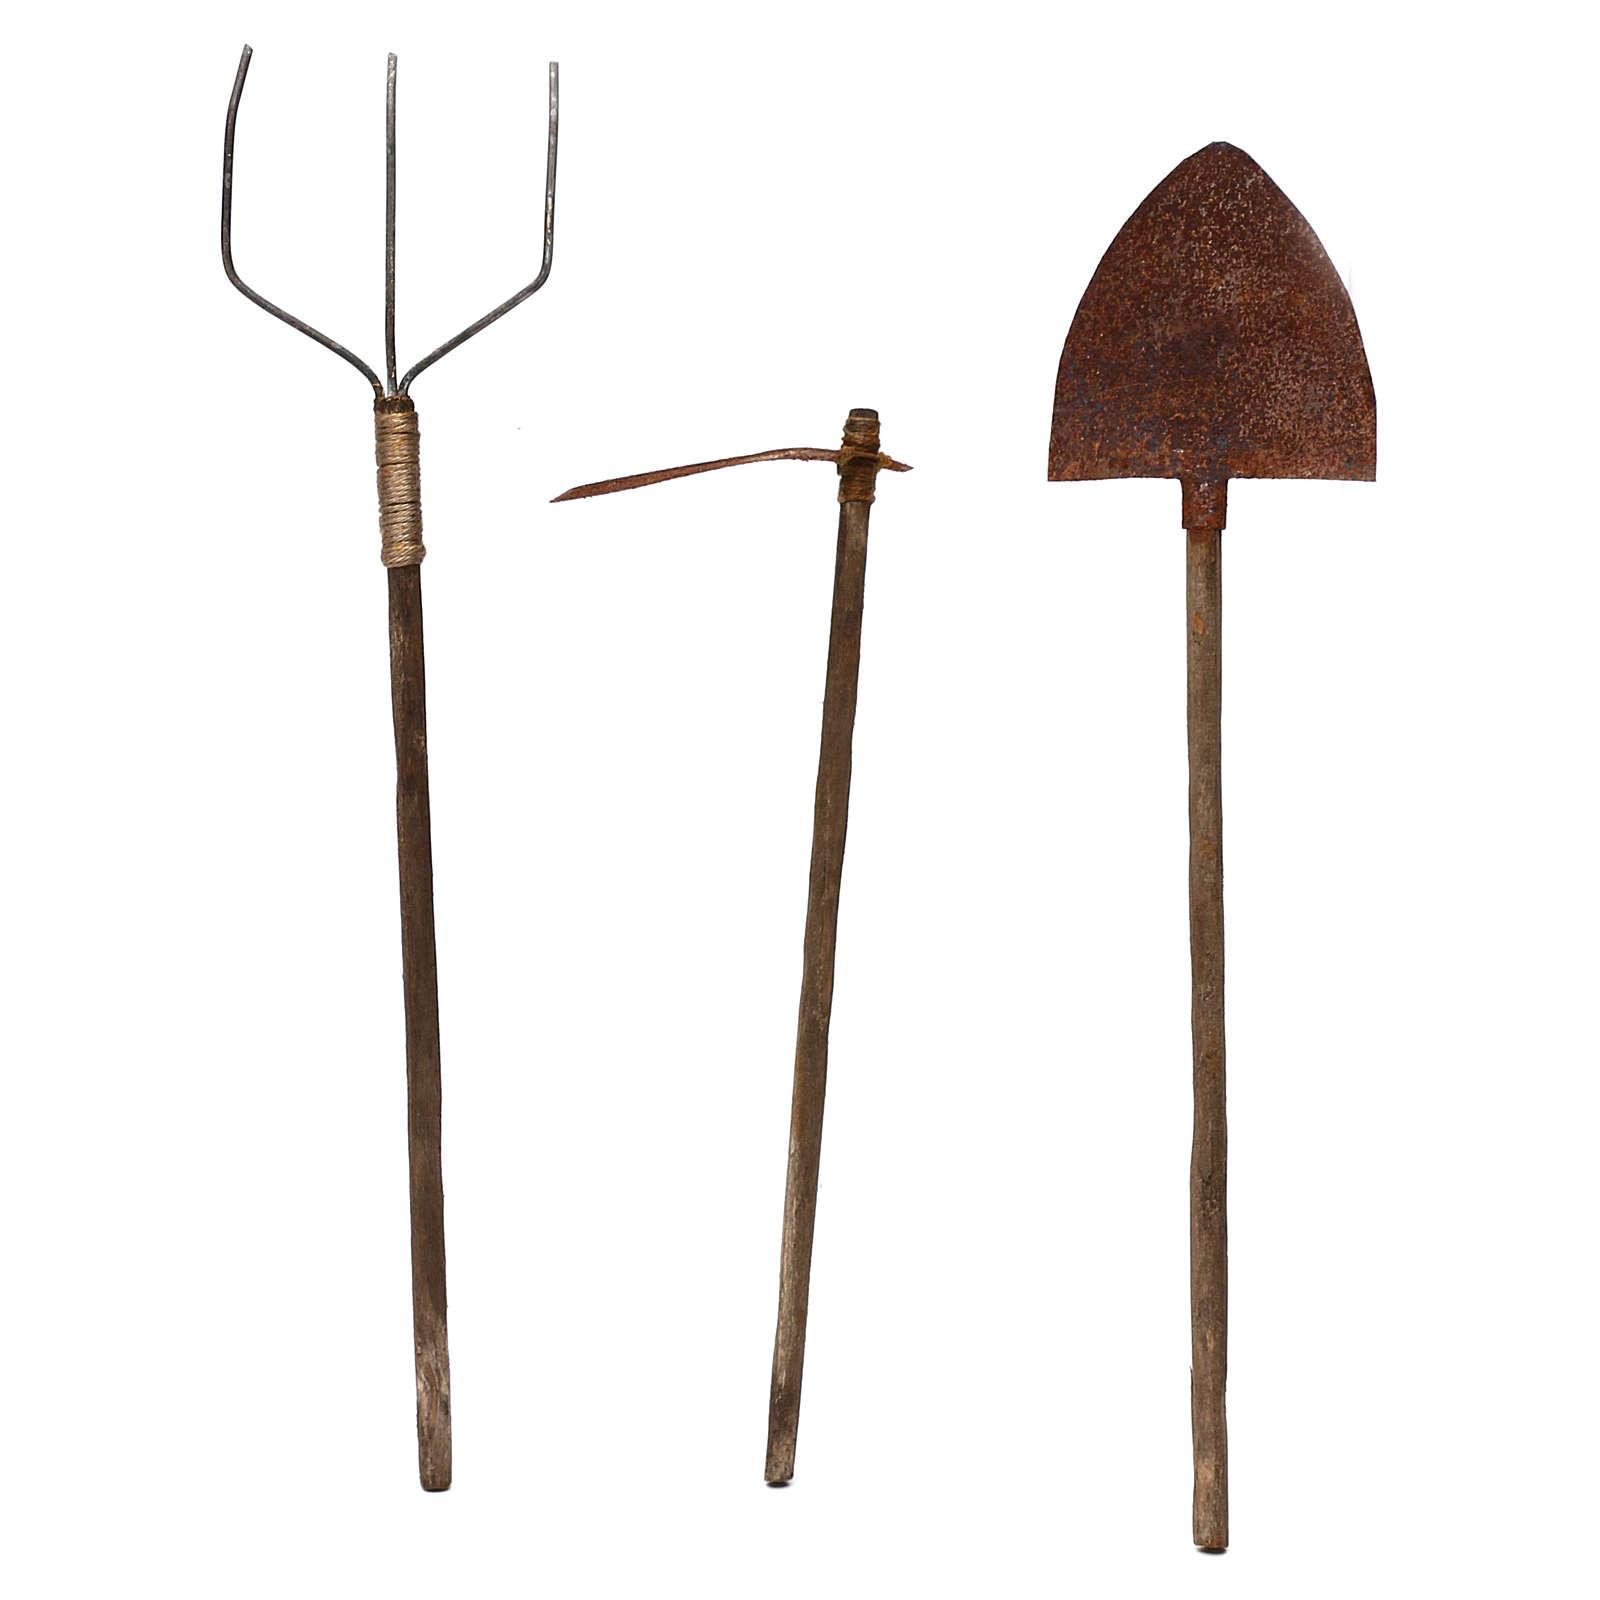 Work tools three models in metal and wood, 22 Neapolitan nativity 4